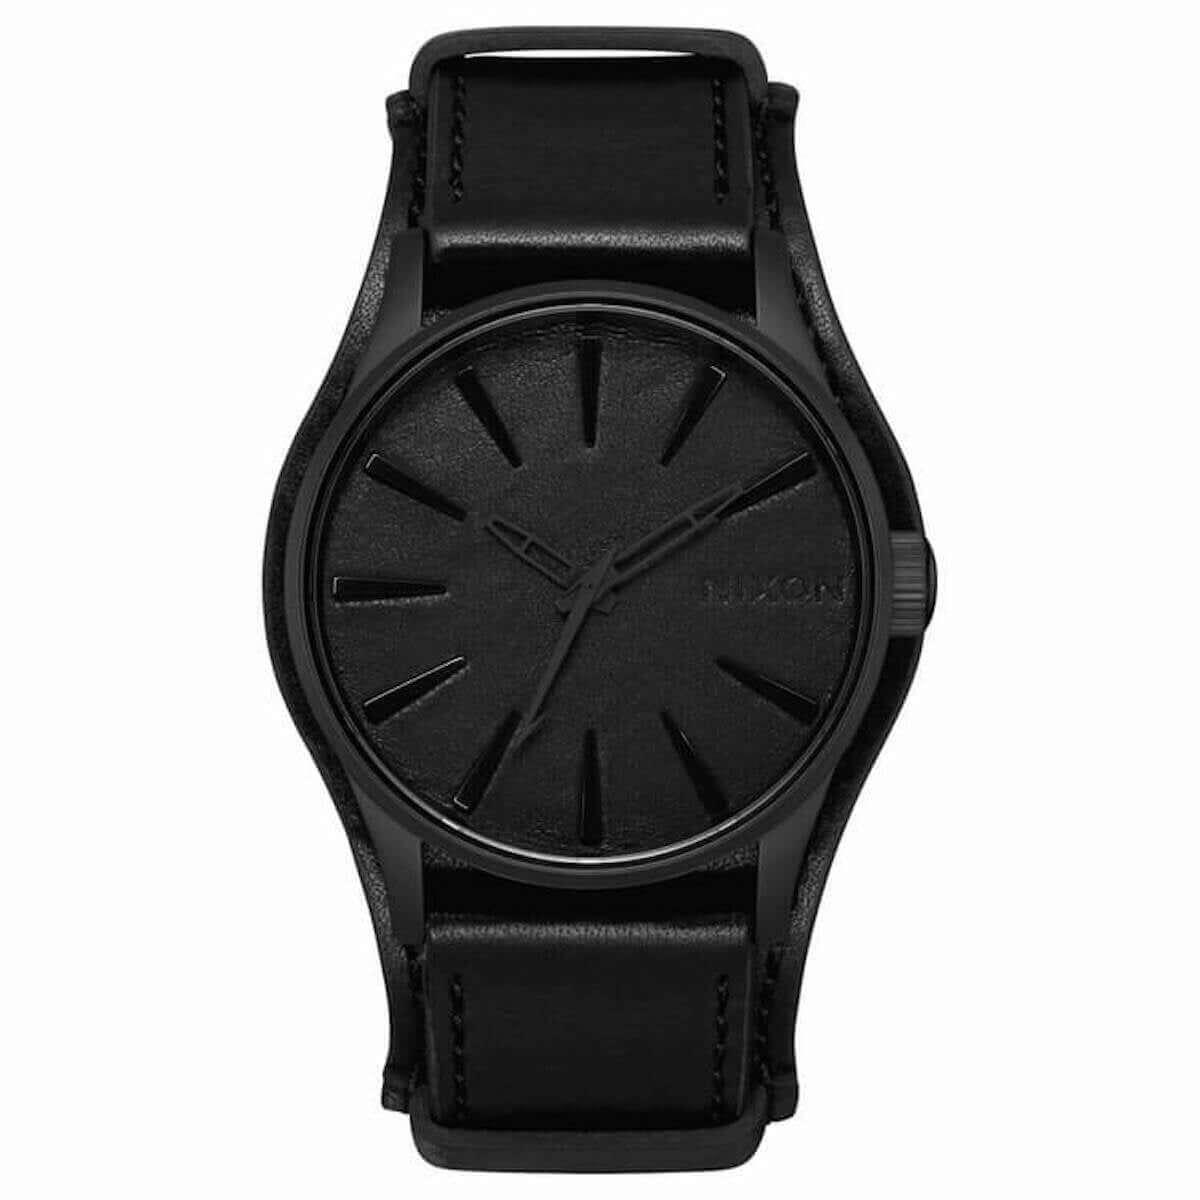 METALLICA X NIXON メタリカの名盤が腕時計に! music181112_nixon-metallica_7-1200x1200